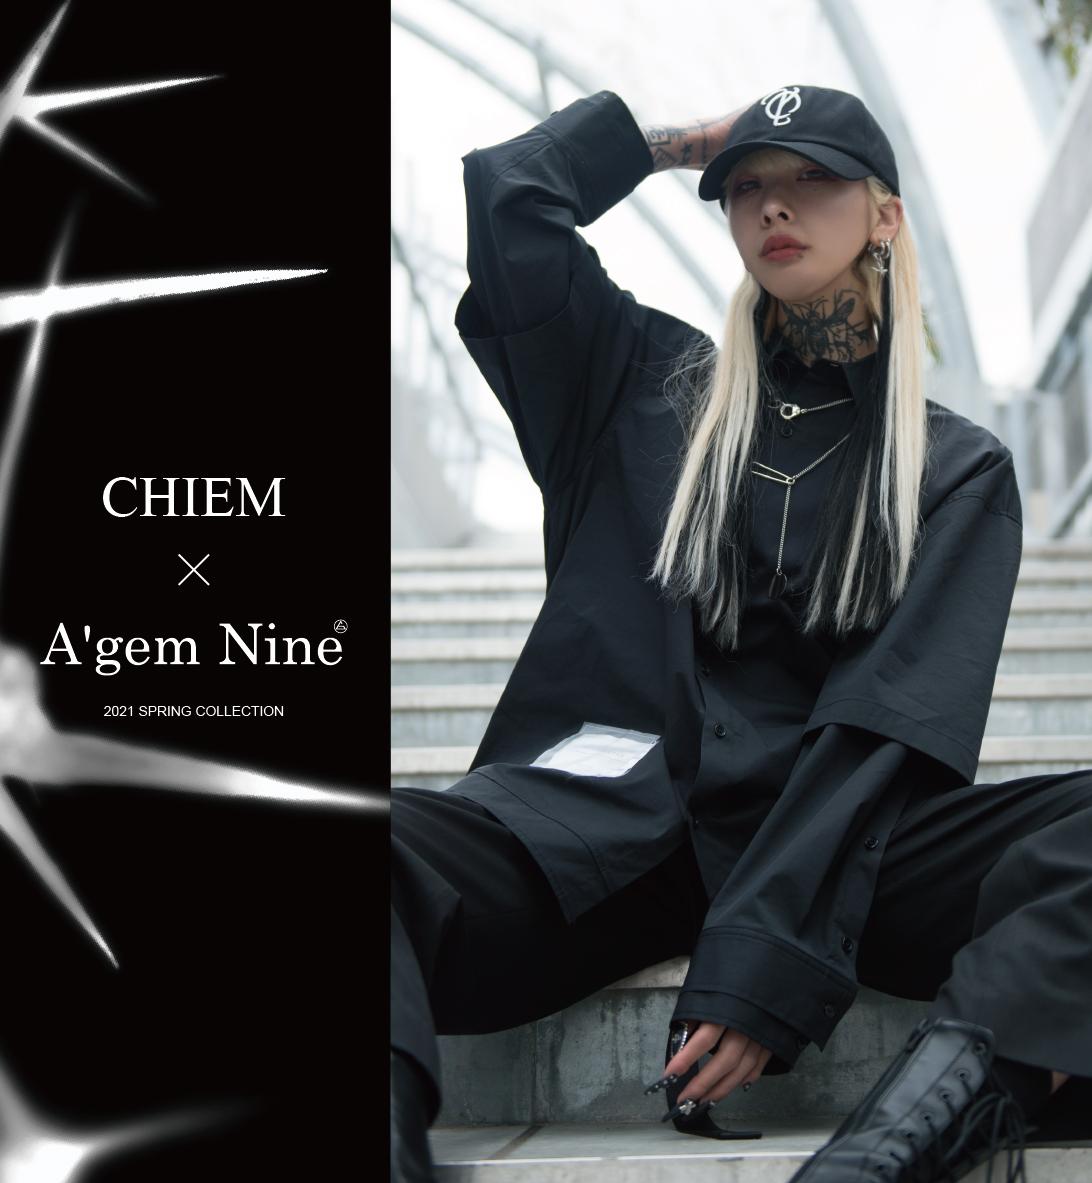 A'GEM/9×chiem 2021 SPRING COLLECTION